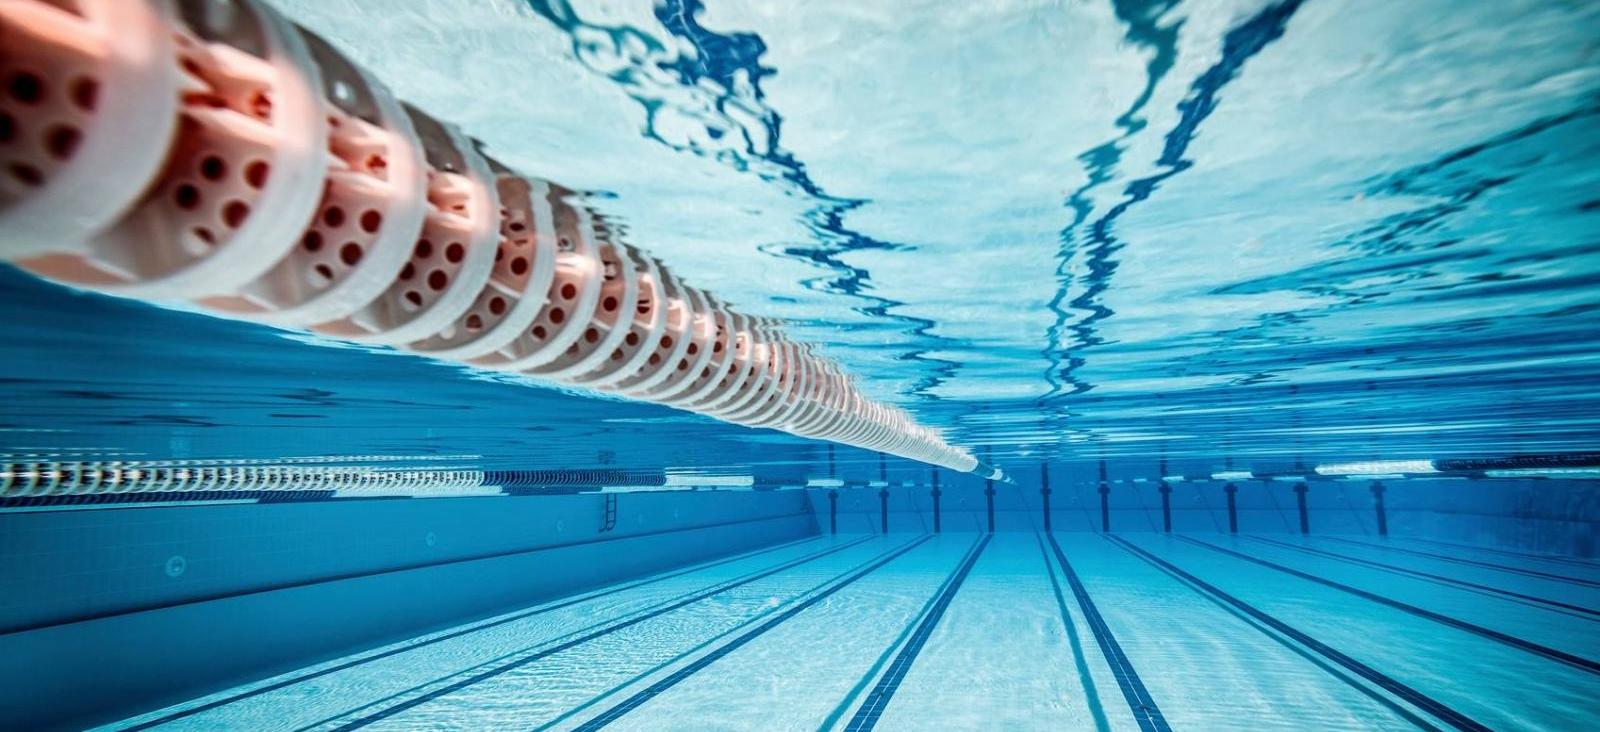 underwater photo.jpg